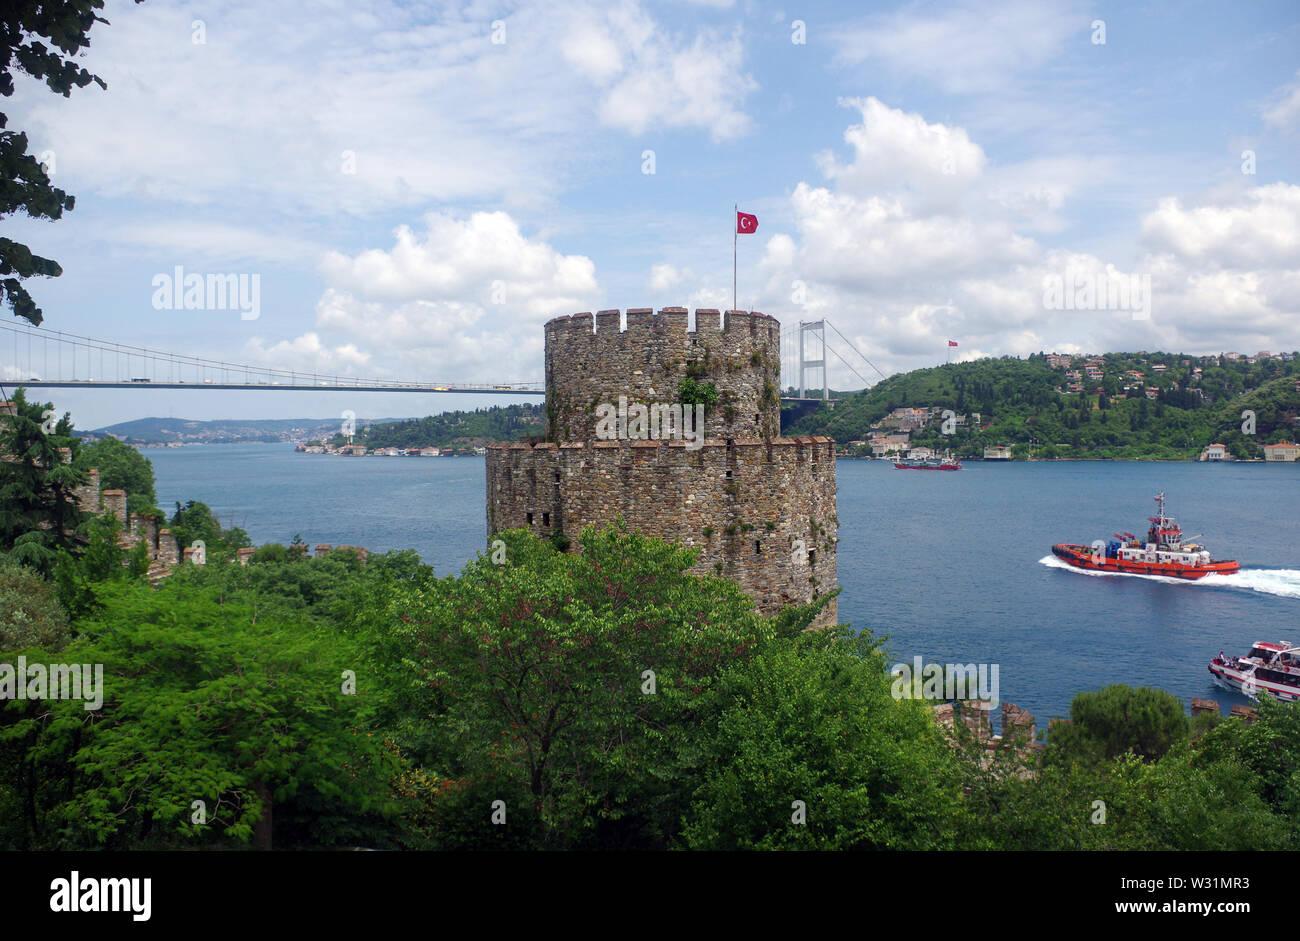 Rumelihisar Castle guarding the Bosphorus, with Fatih Sultan Mehmet Bridge visible in the background, Istanbul, Turkey Stock Photo